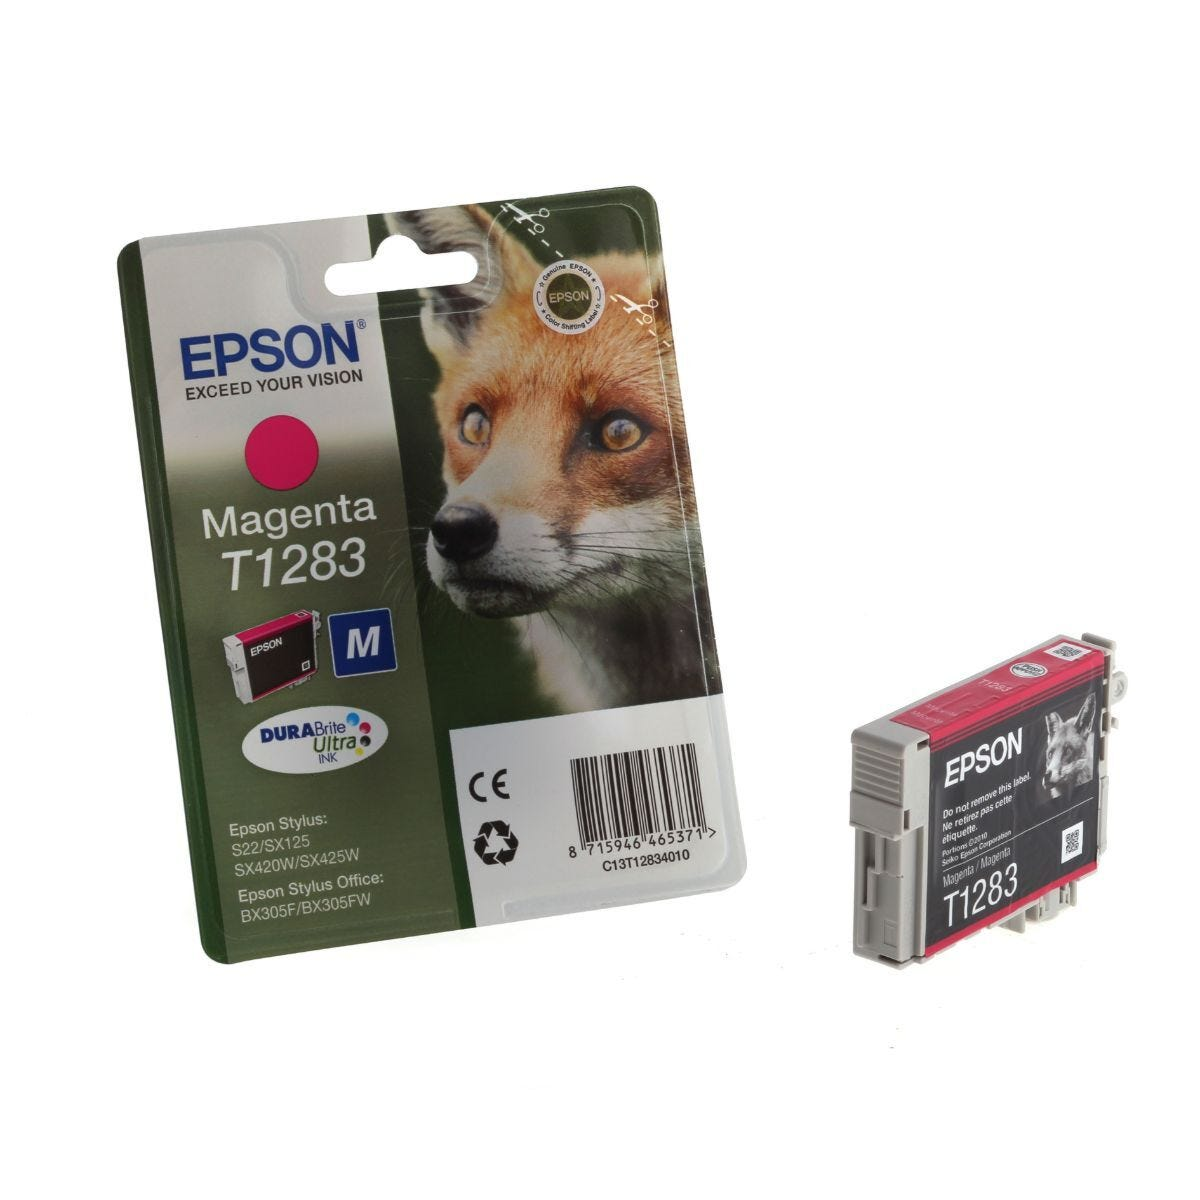 Epson Inkjet Cartridge T1283 3.5ml